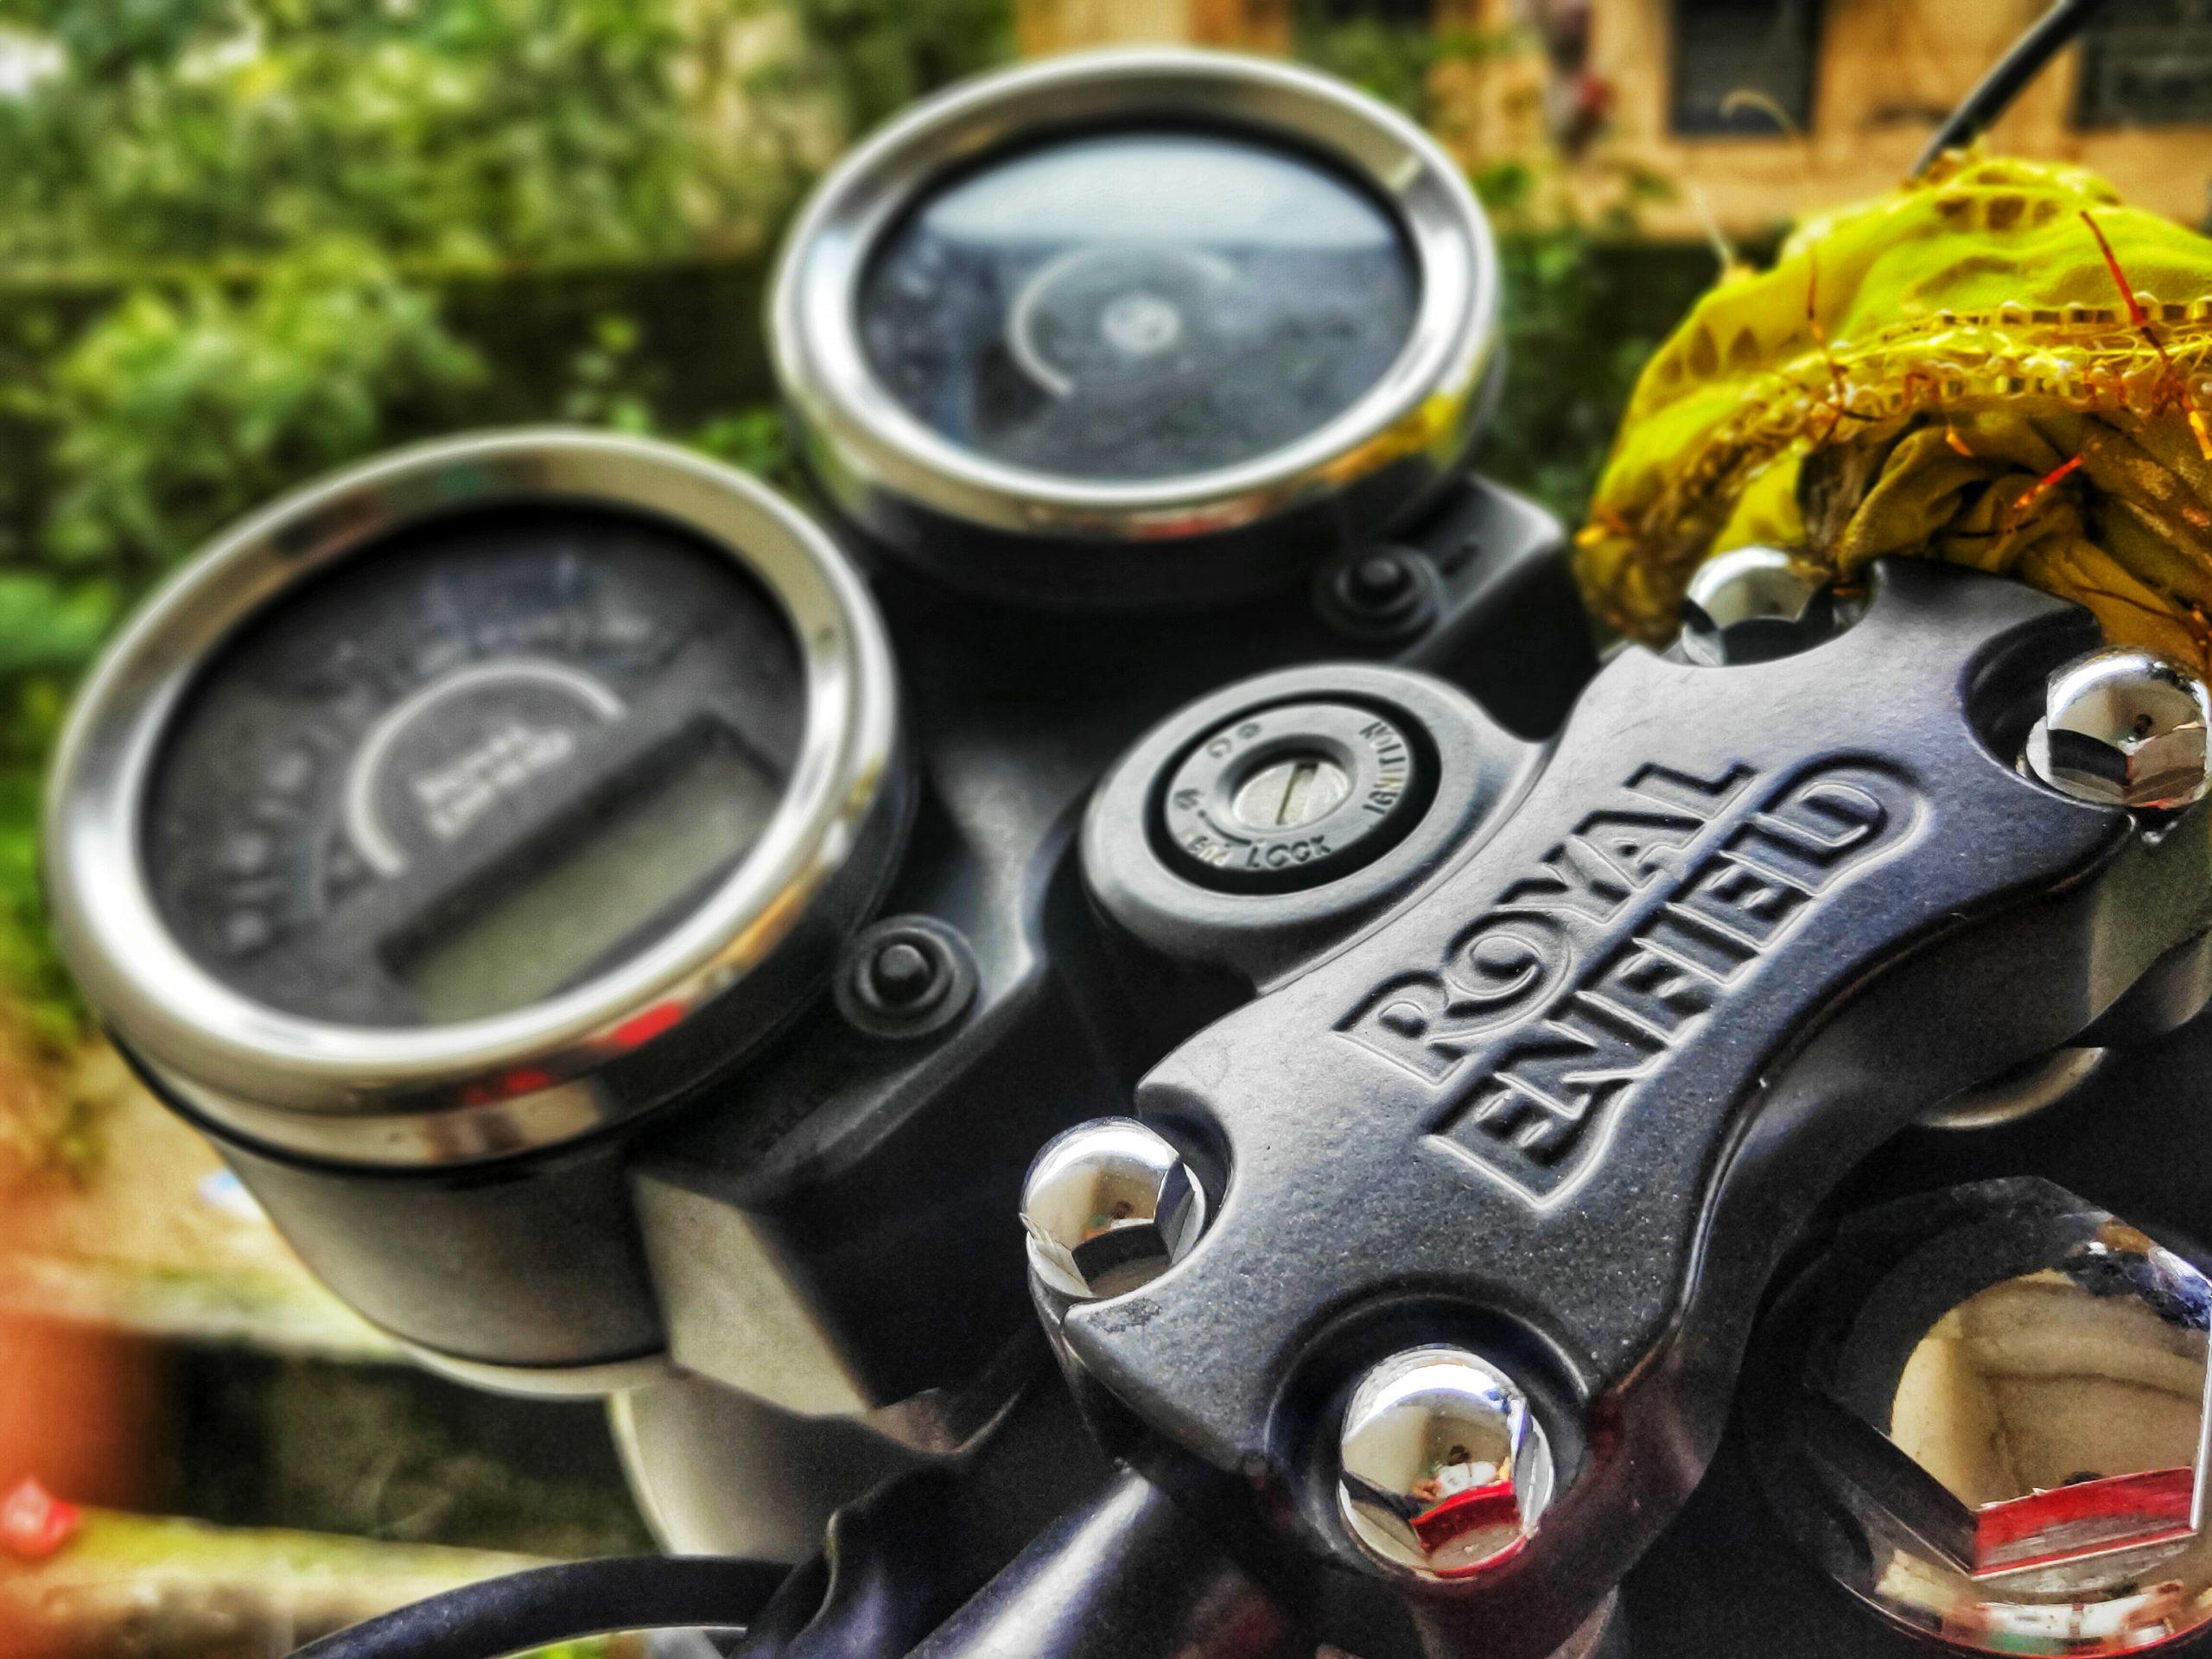 Bullet bike's speedometer